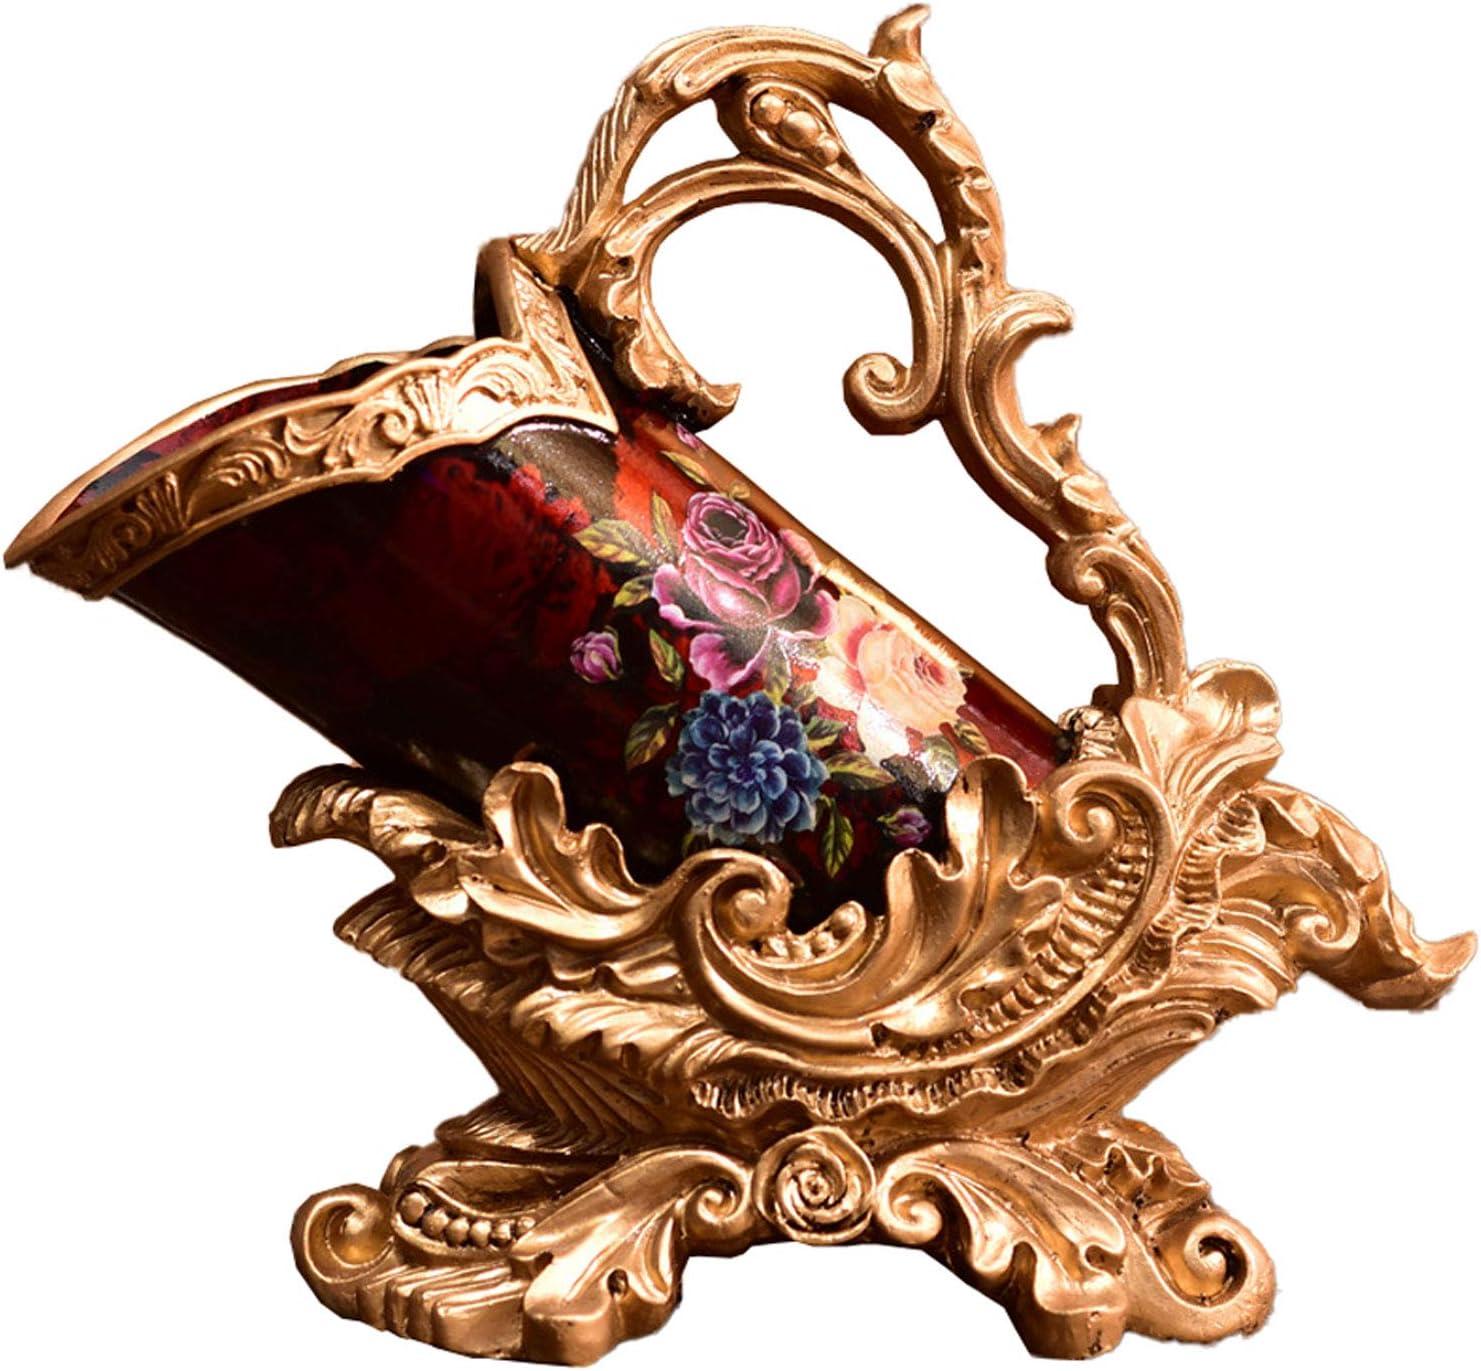 Estante para Vino Estante para Vino, Decoración De Resina Artesanal Pintada, Artesanías Creativas De Resina para El Hogar, Hecho A Mano, con Pintura Retro De Rosas, Estilo Clásico